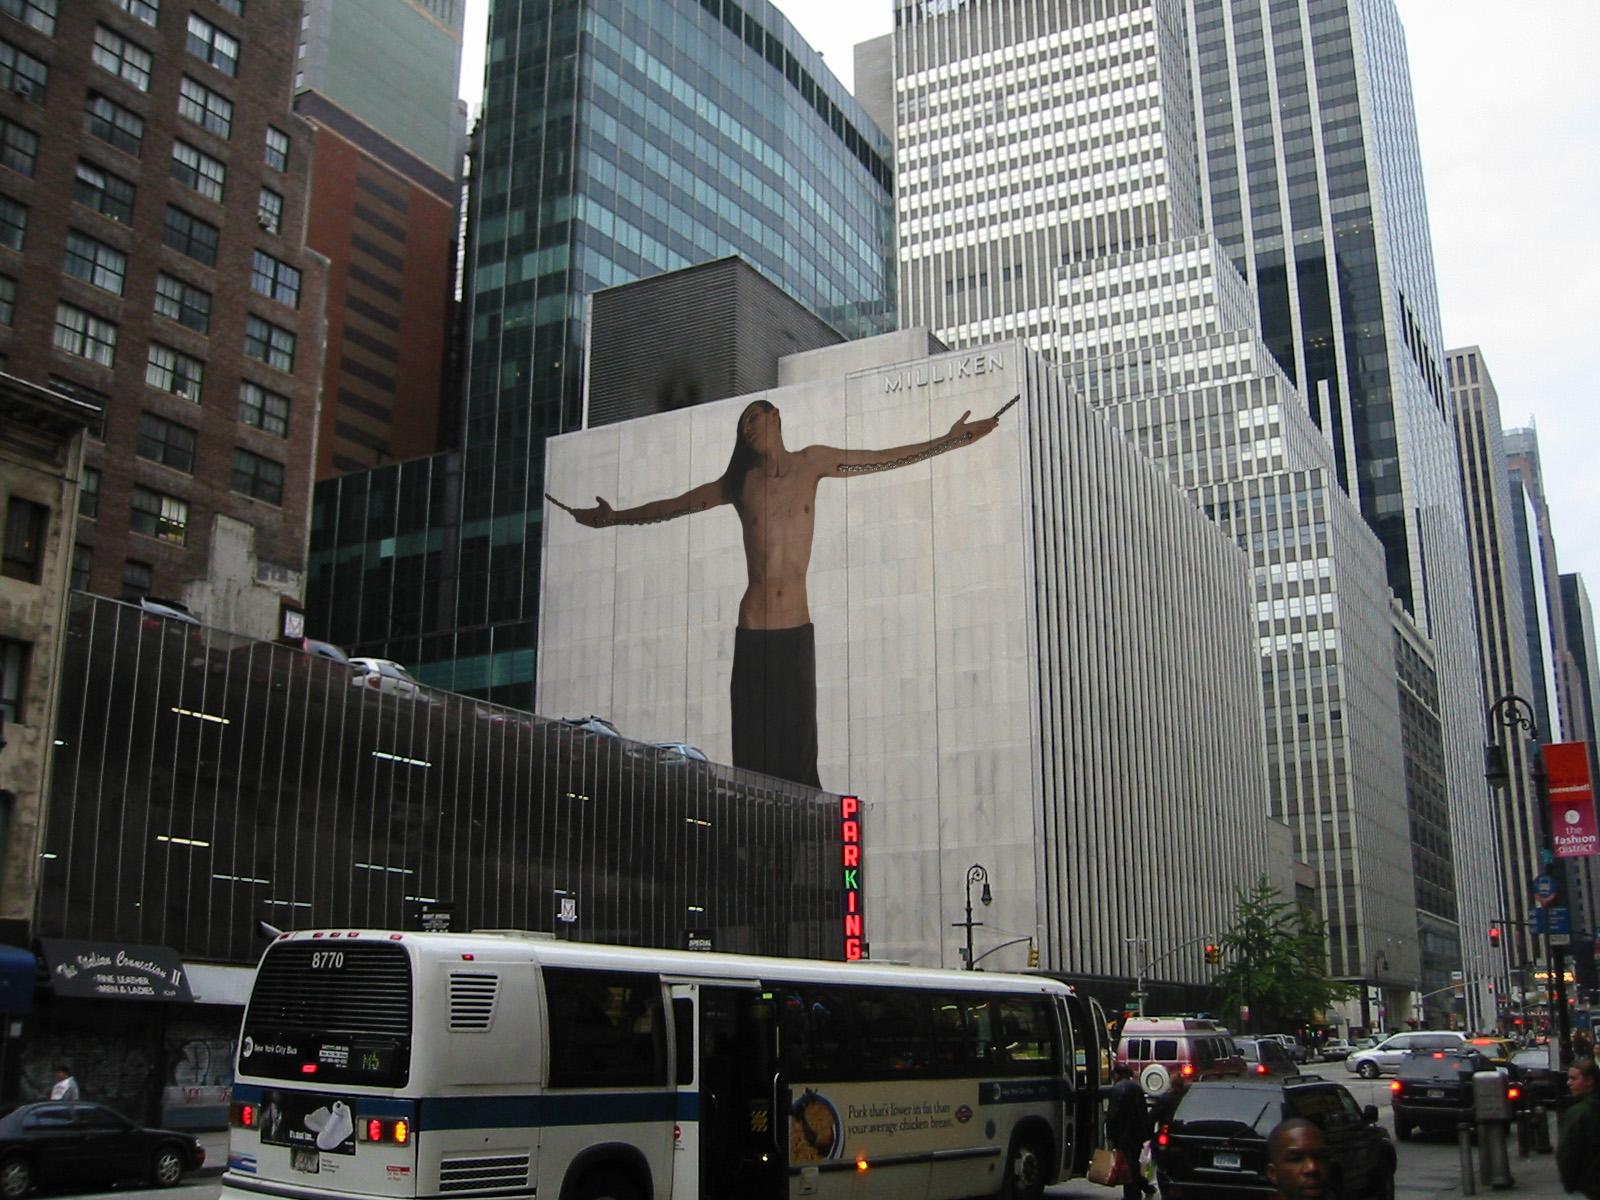 21st Century Crucifixion